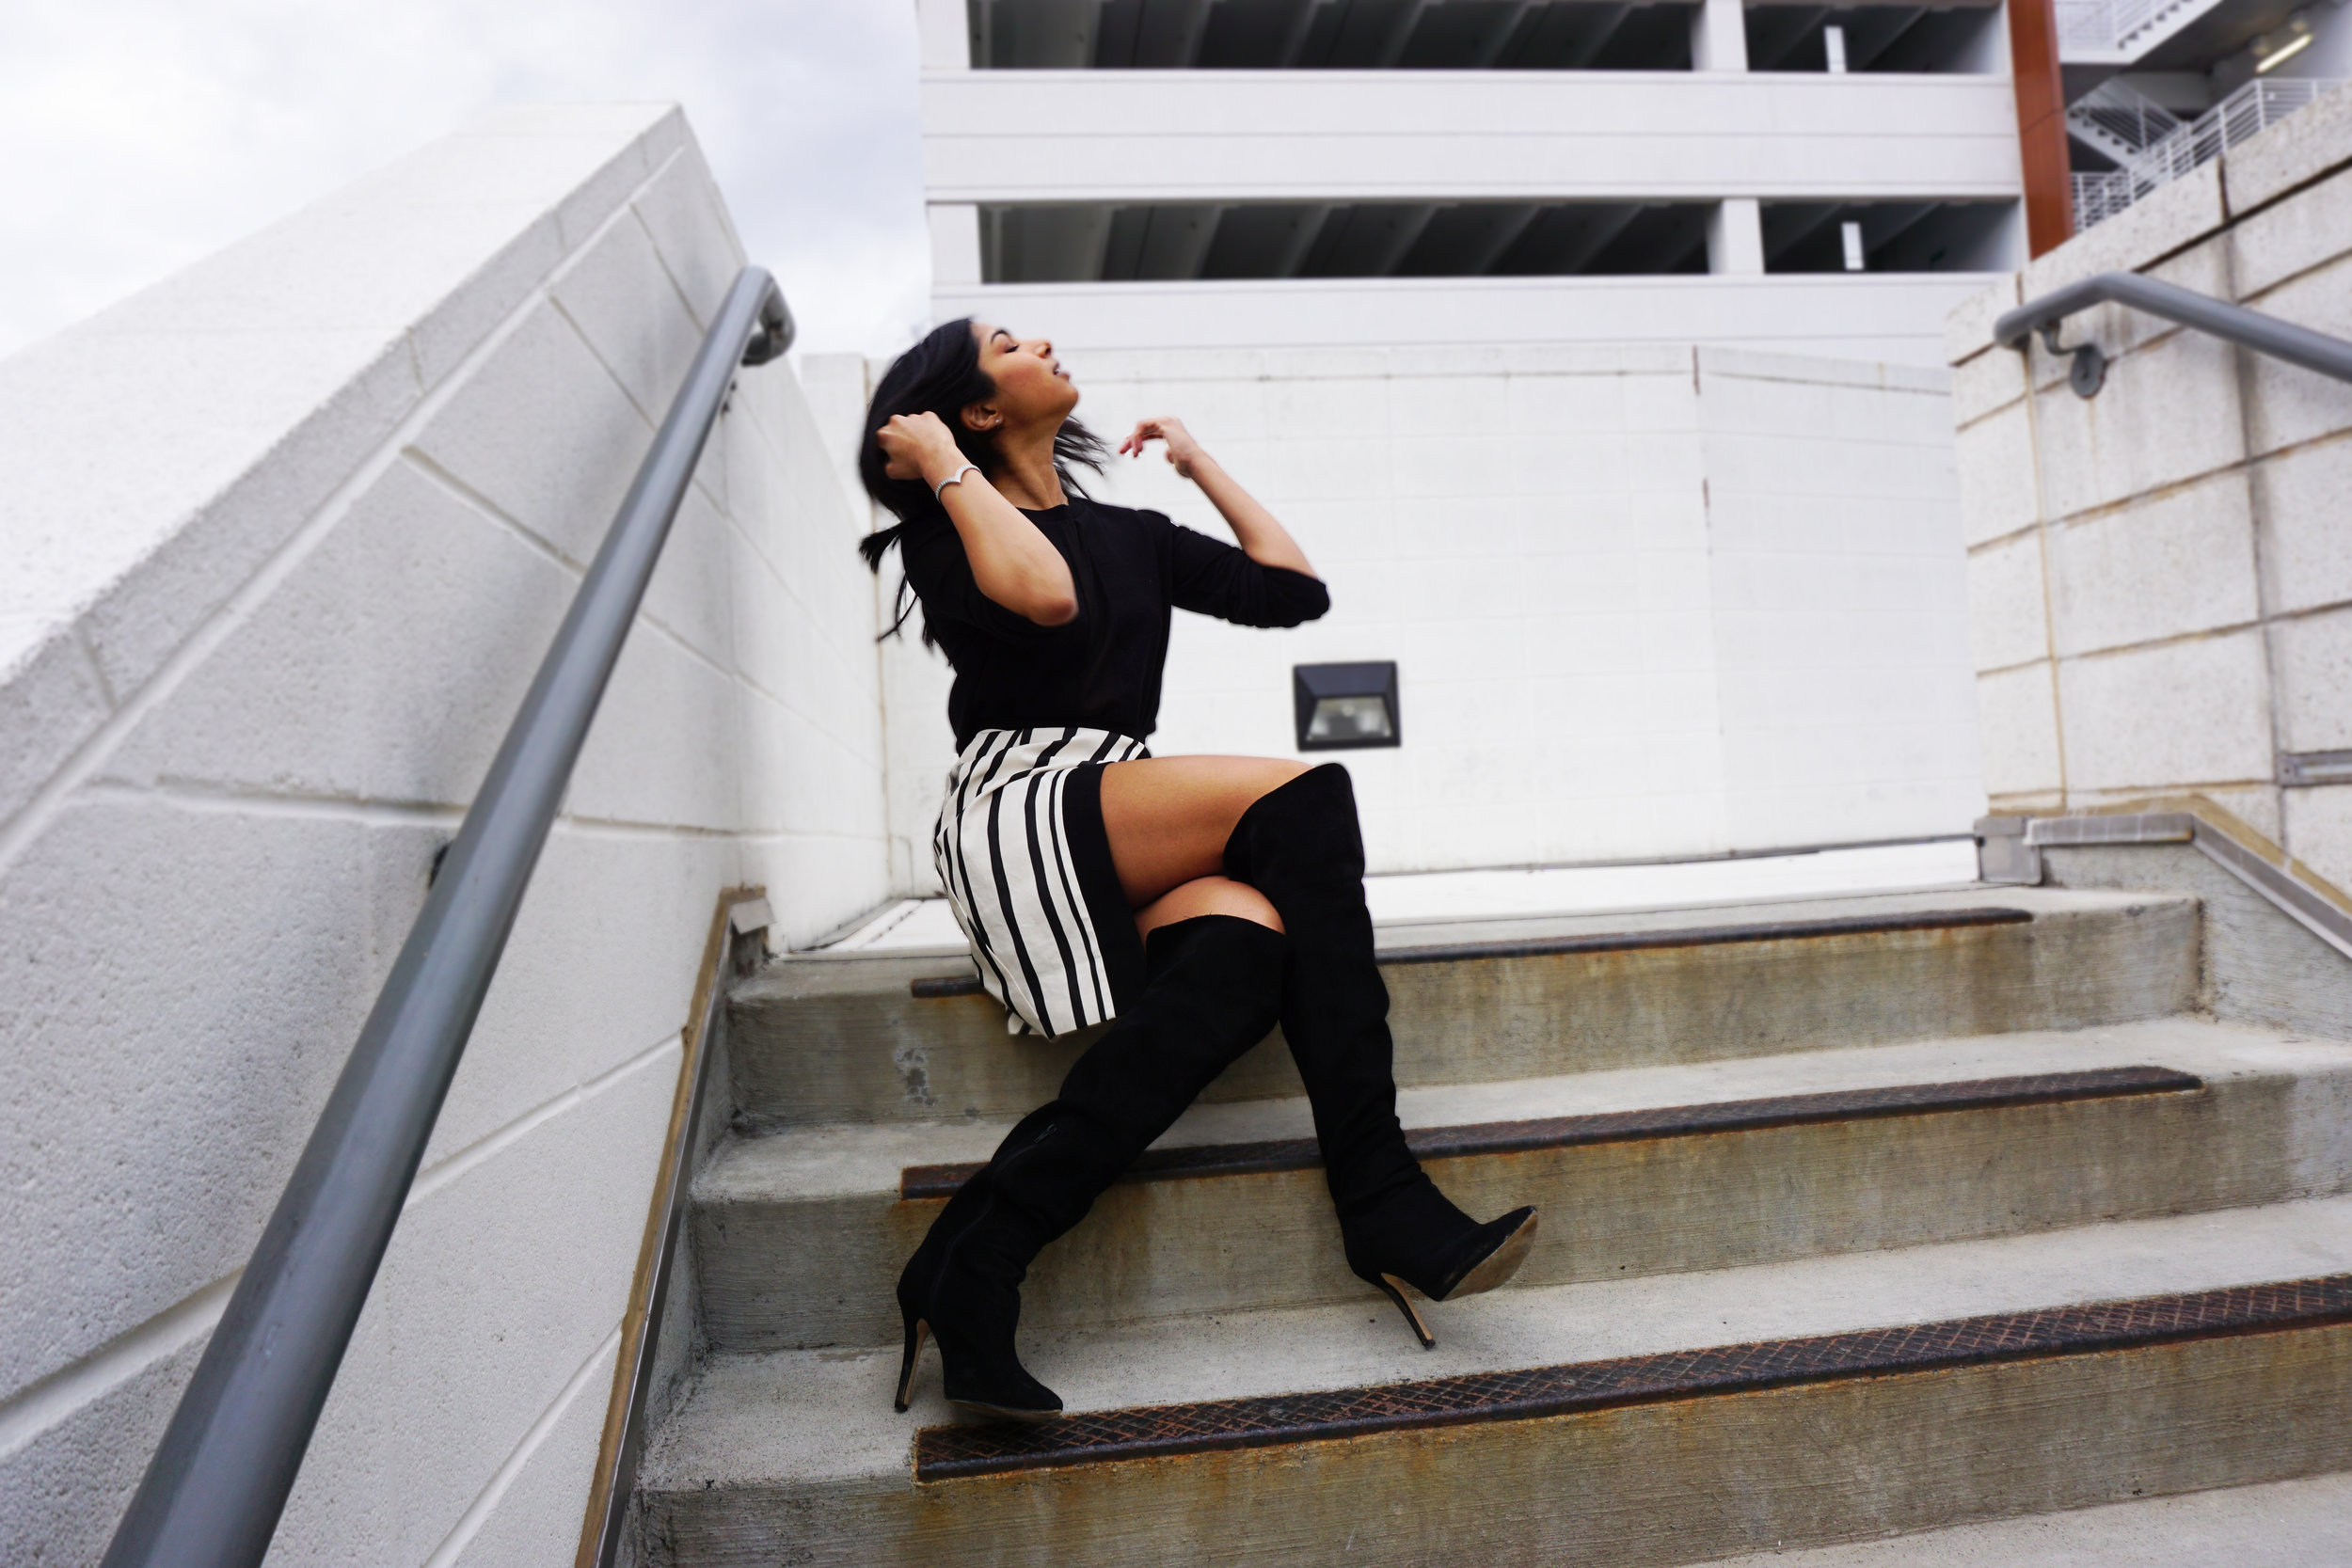 Top - Forever 21   Skirt - H&M   Boots - Kohl's   Bracelet - Jewel Mint